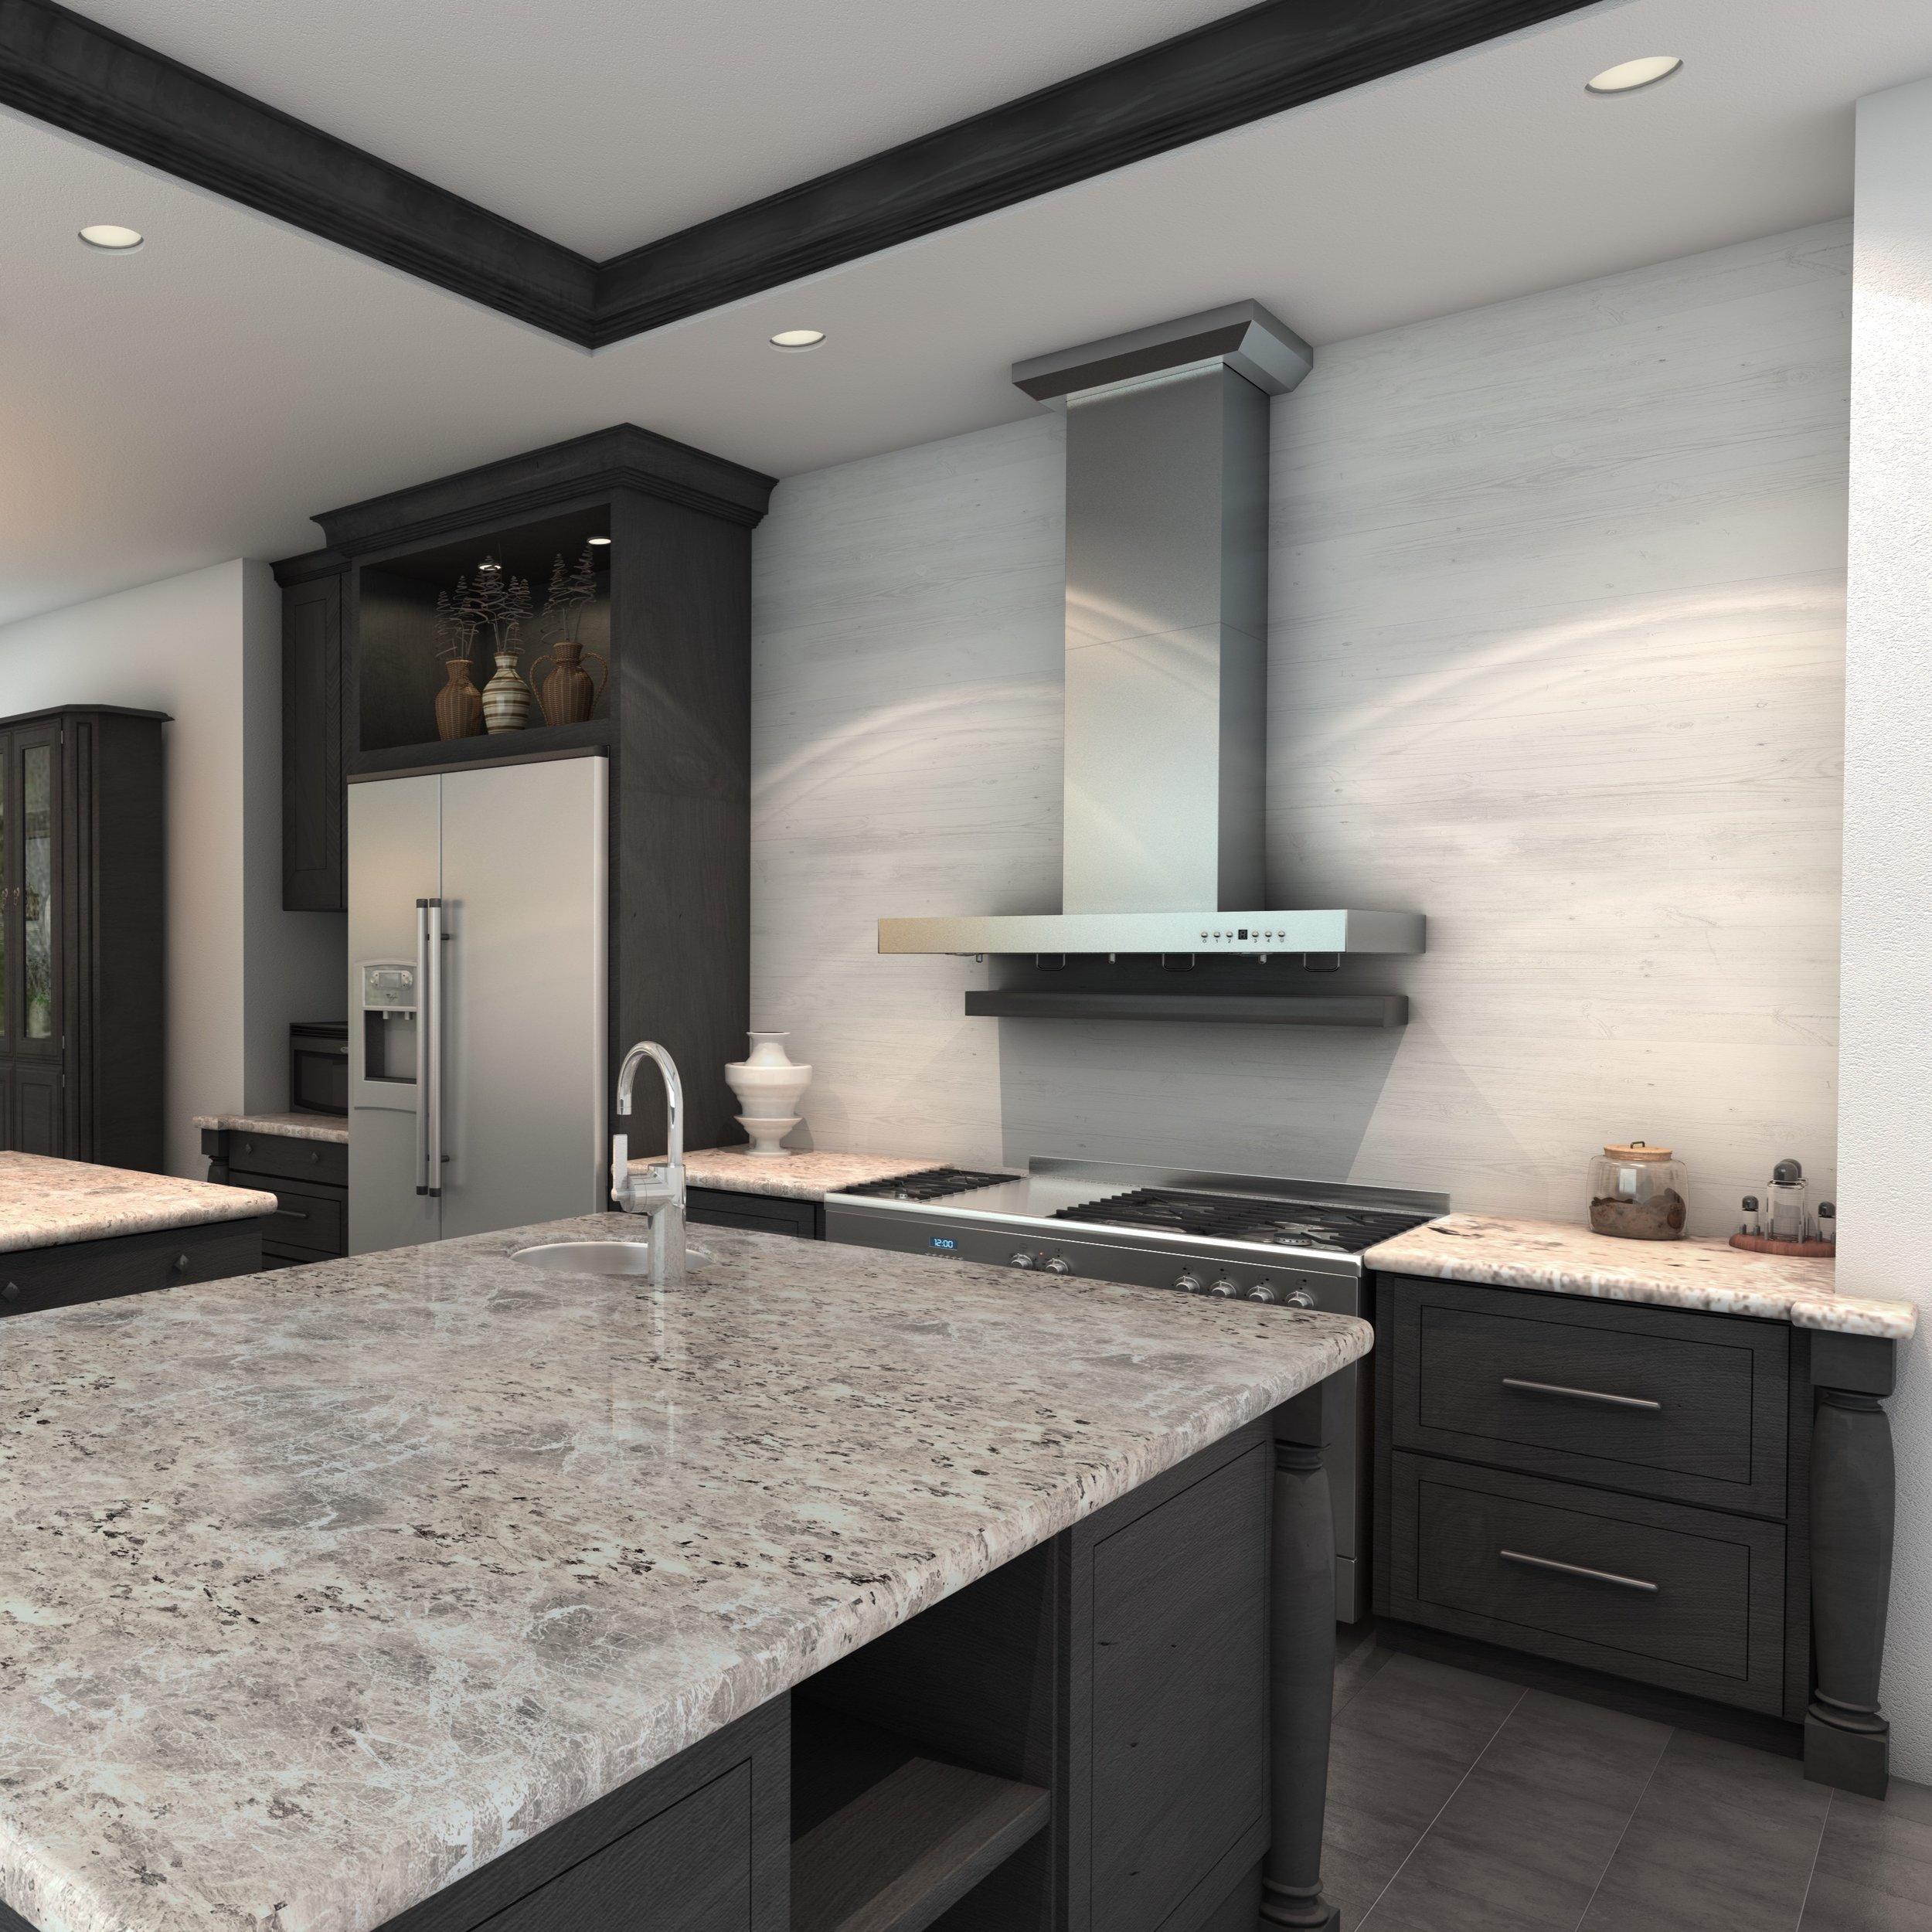 zline-stainless-steel-wall-mounted-range-hood-KE-kitchen 1.jpeg